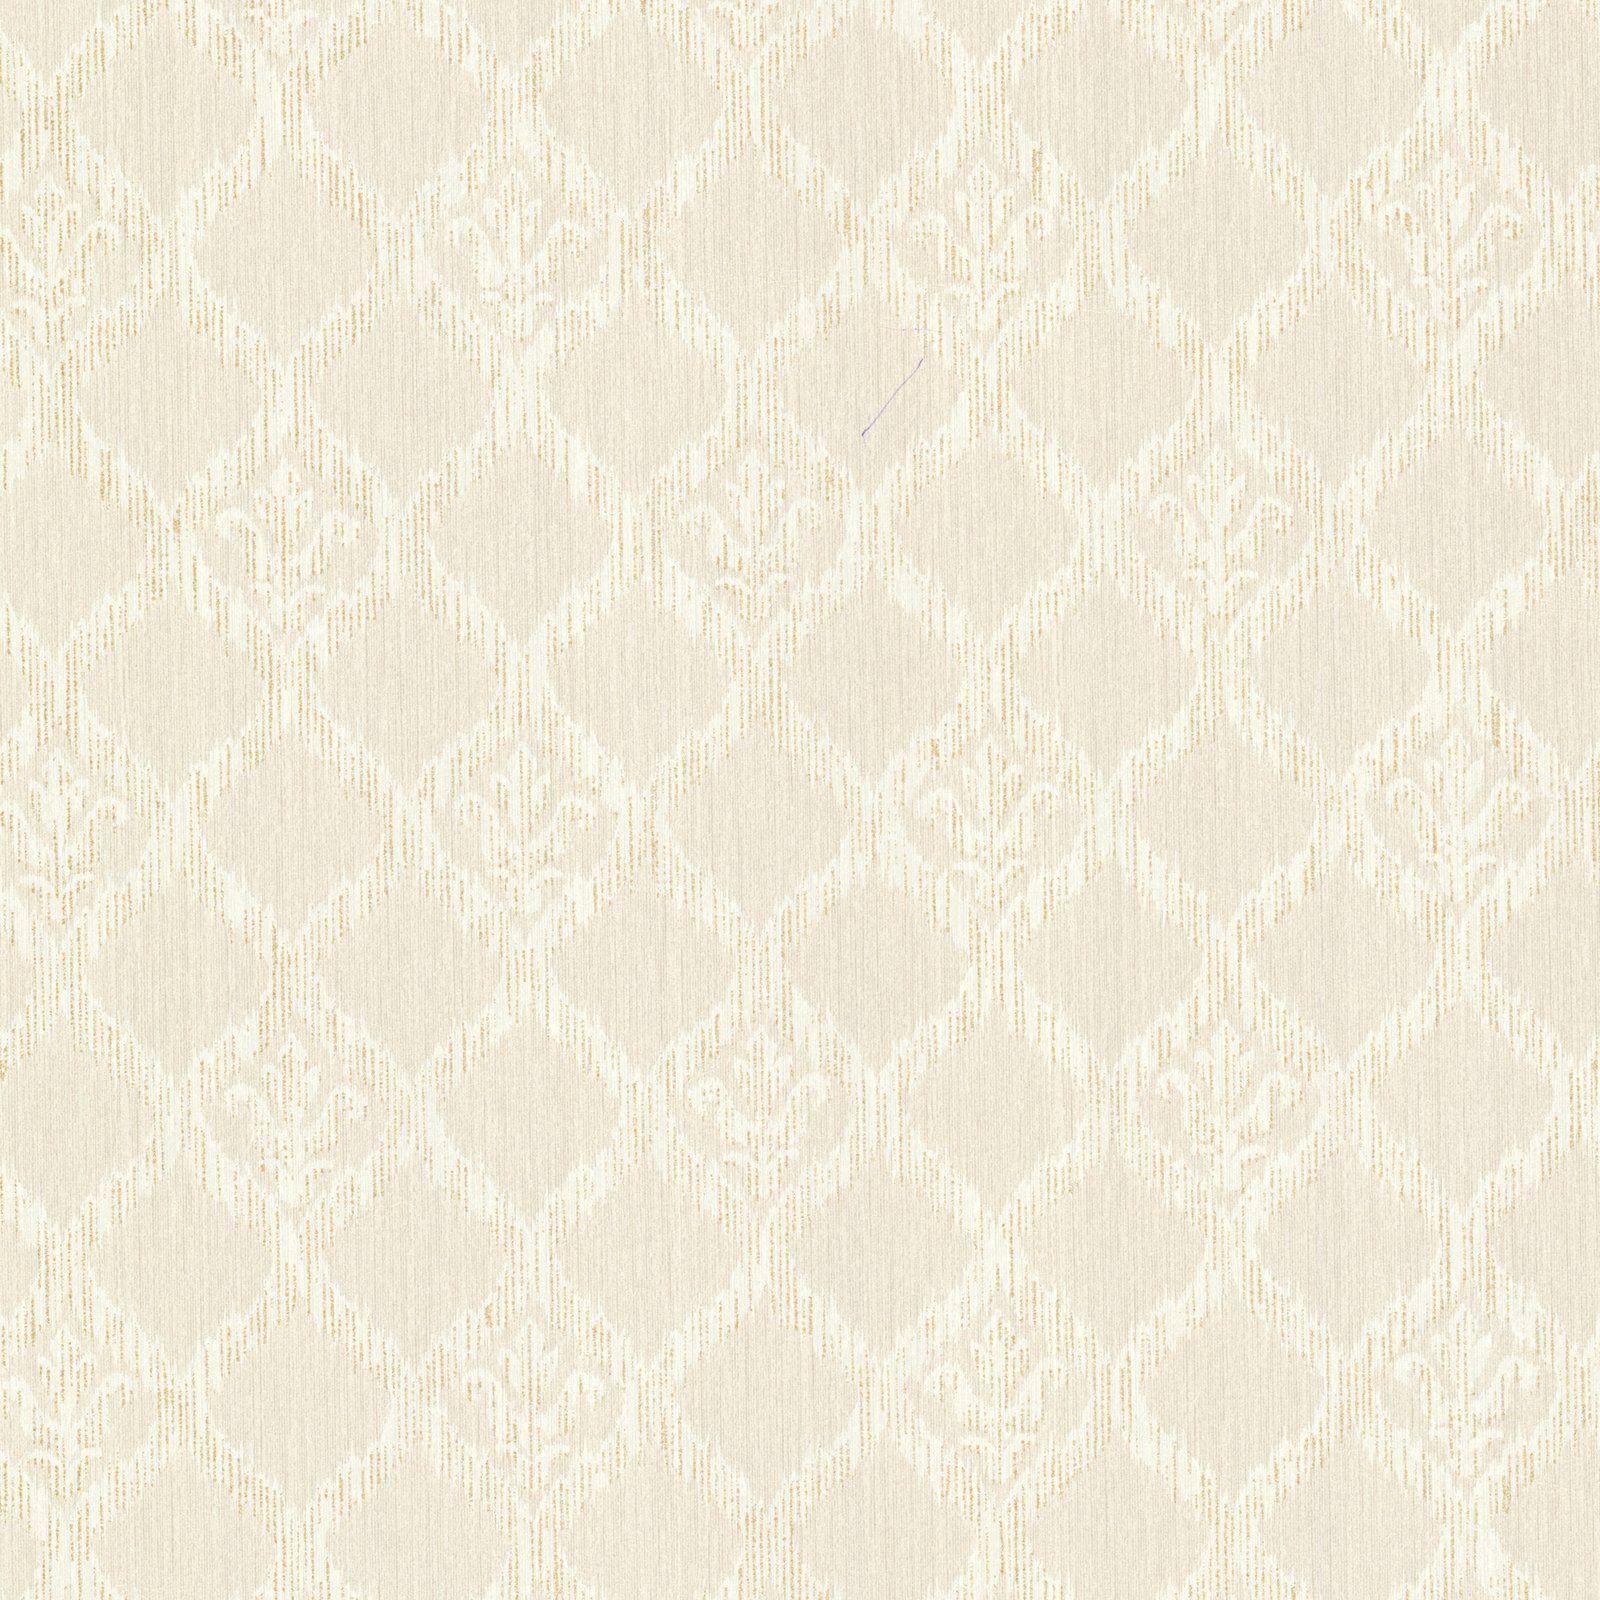 James Jakarta Ikat Motif Wallpaper Champagne